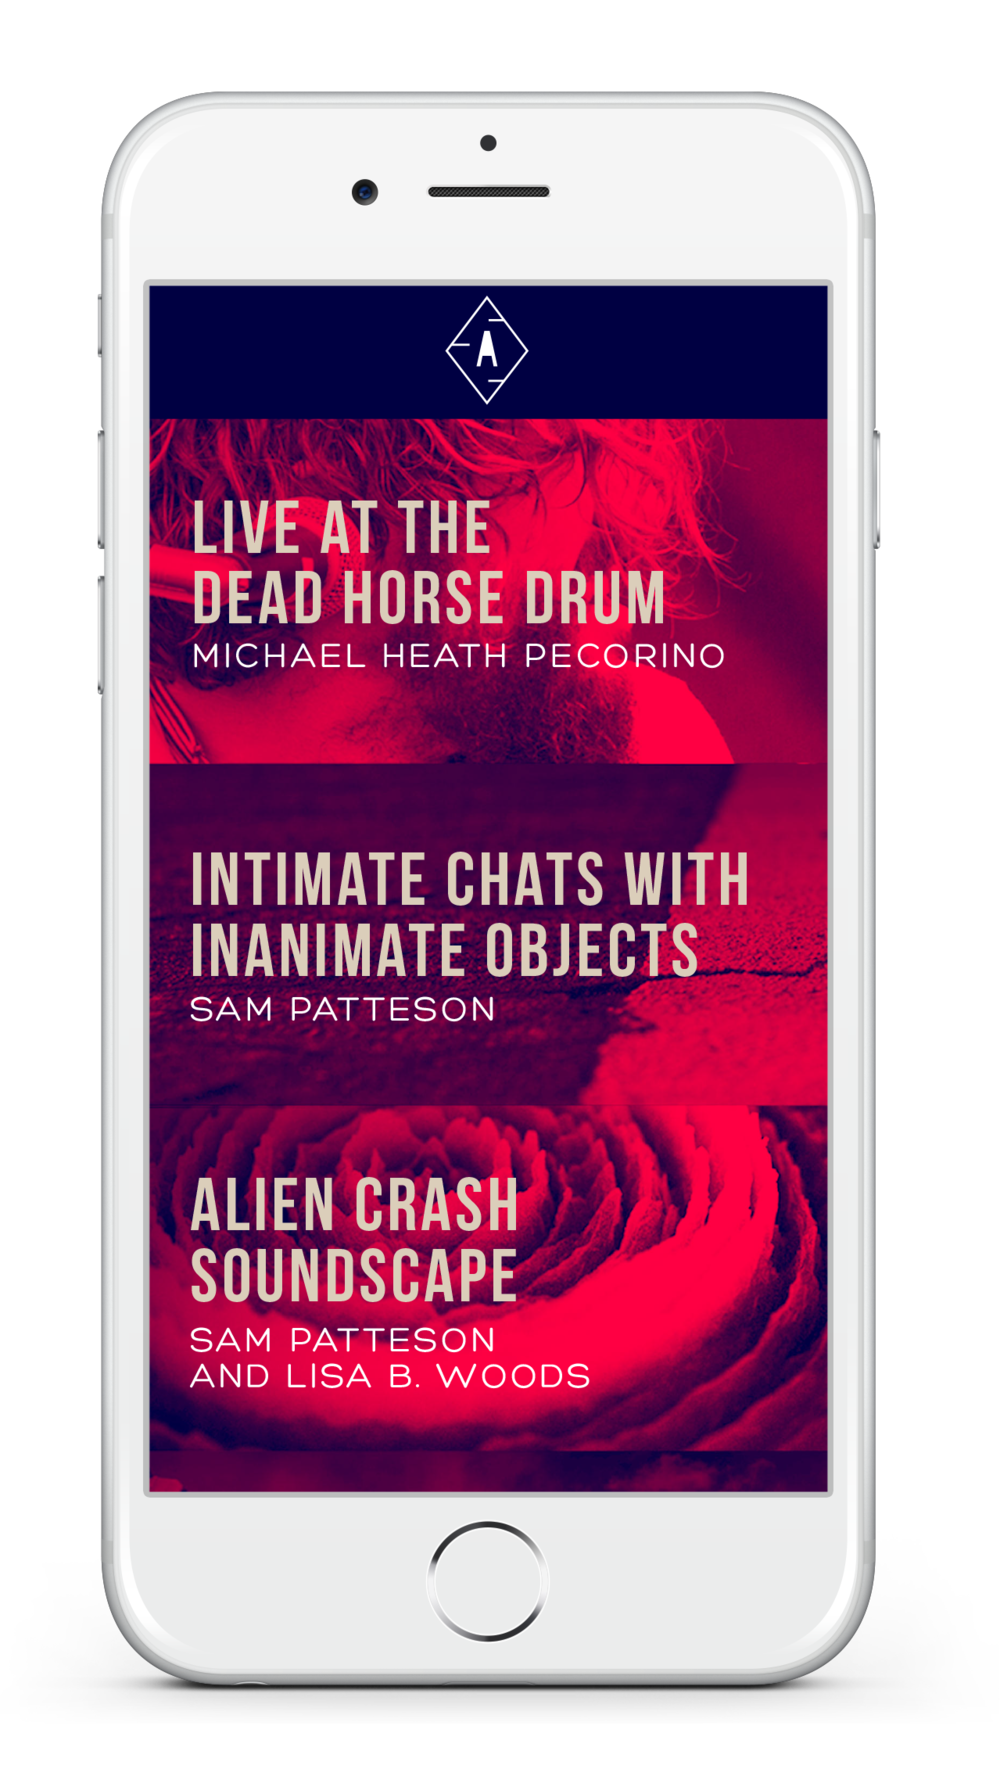 Asunder_IoT Storytelling app_iPhone6.jpg